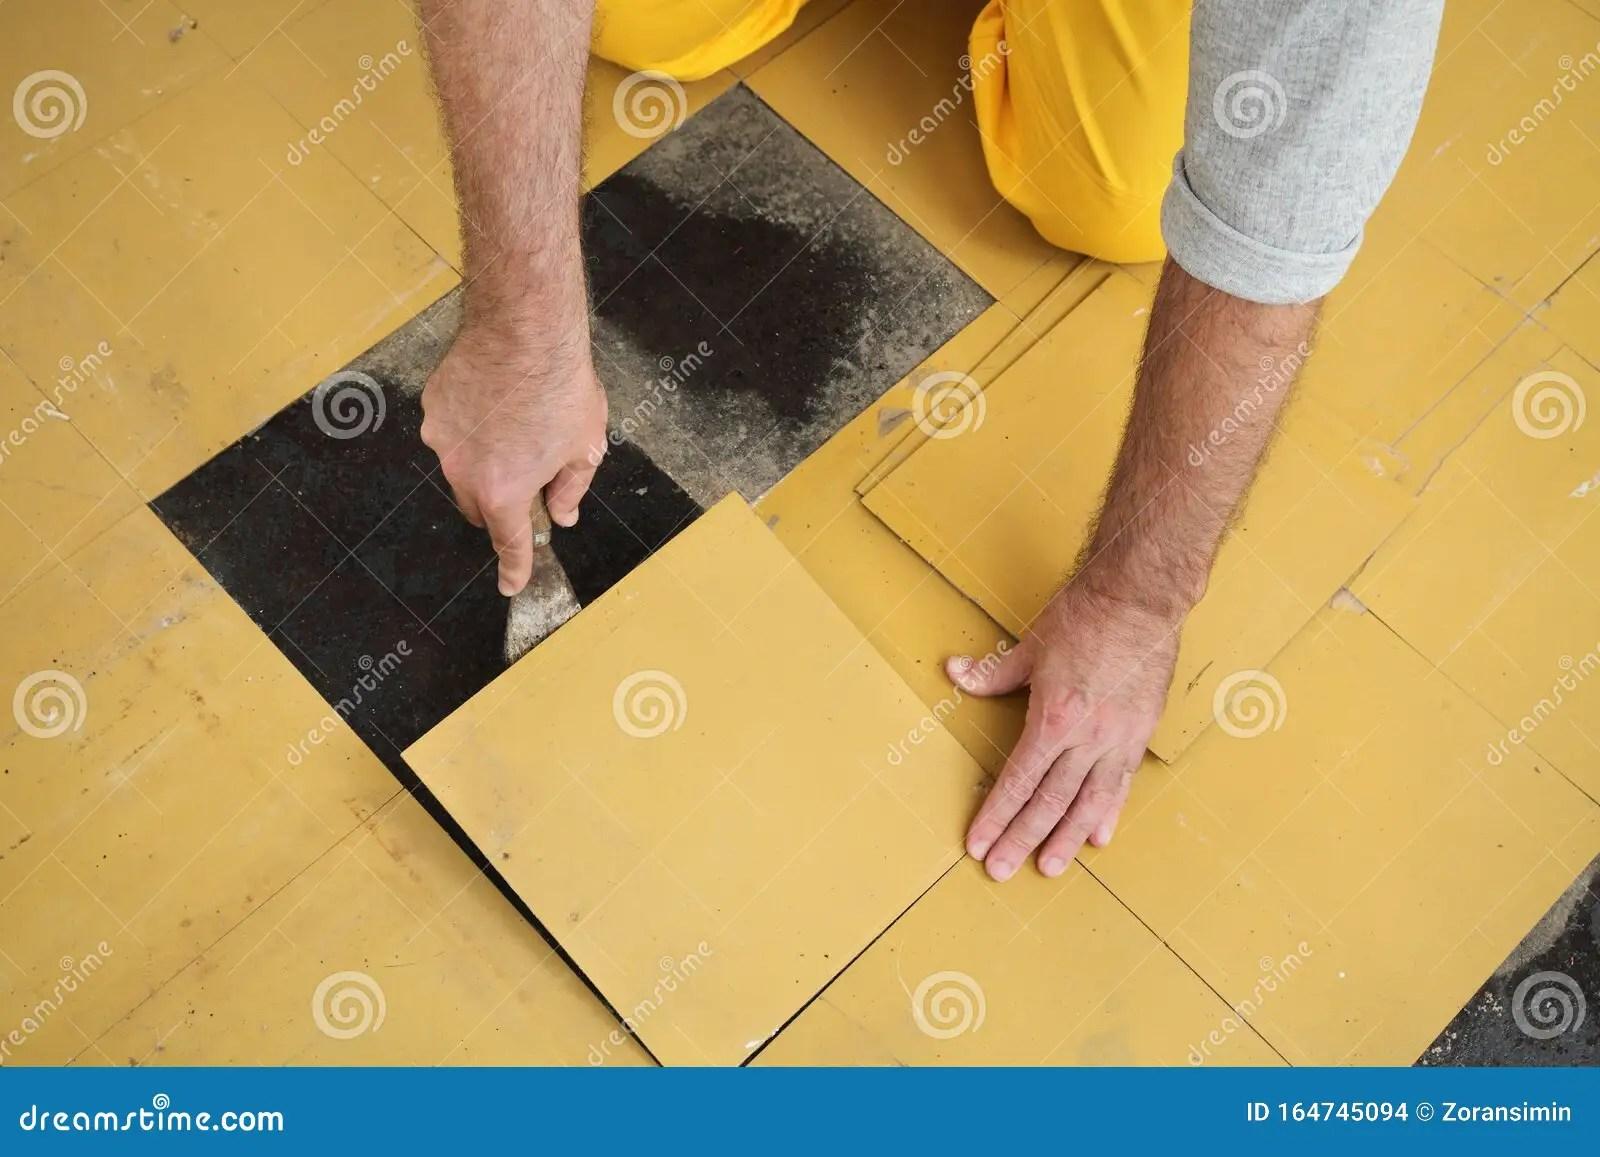 https www dreamstime com old vinyl tiles removal floor room kitchen worker removing old vinyl tiles kitchen floor using spatula trowel image164745094